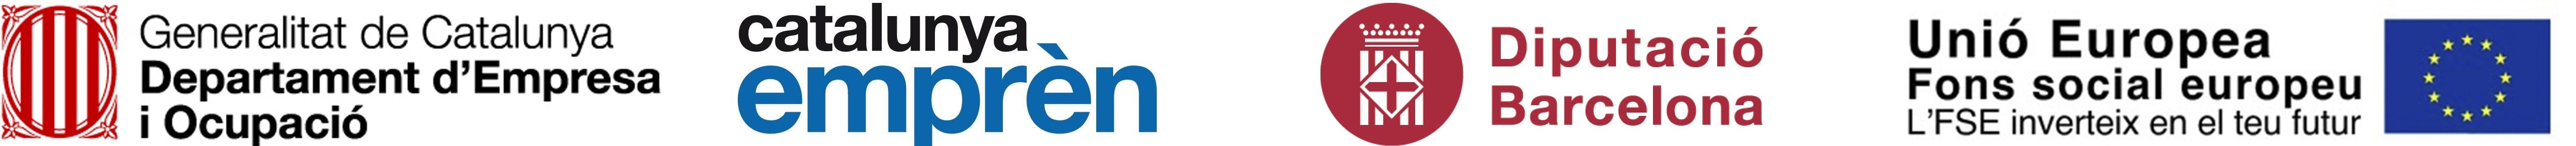 LogoGeneCEmprenDipuUE